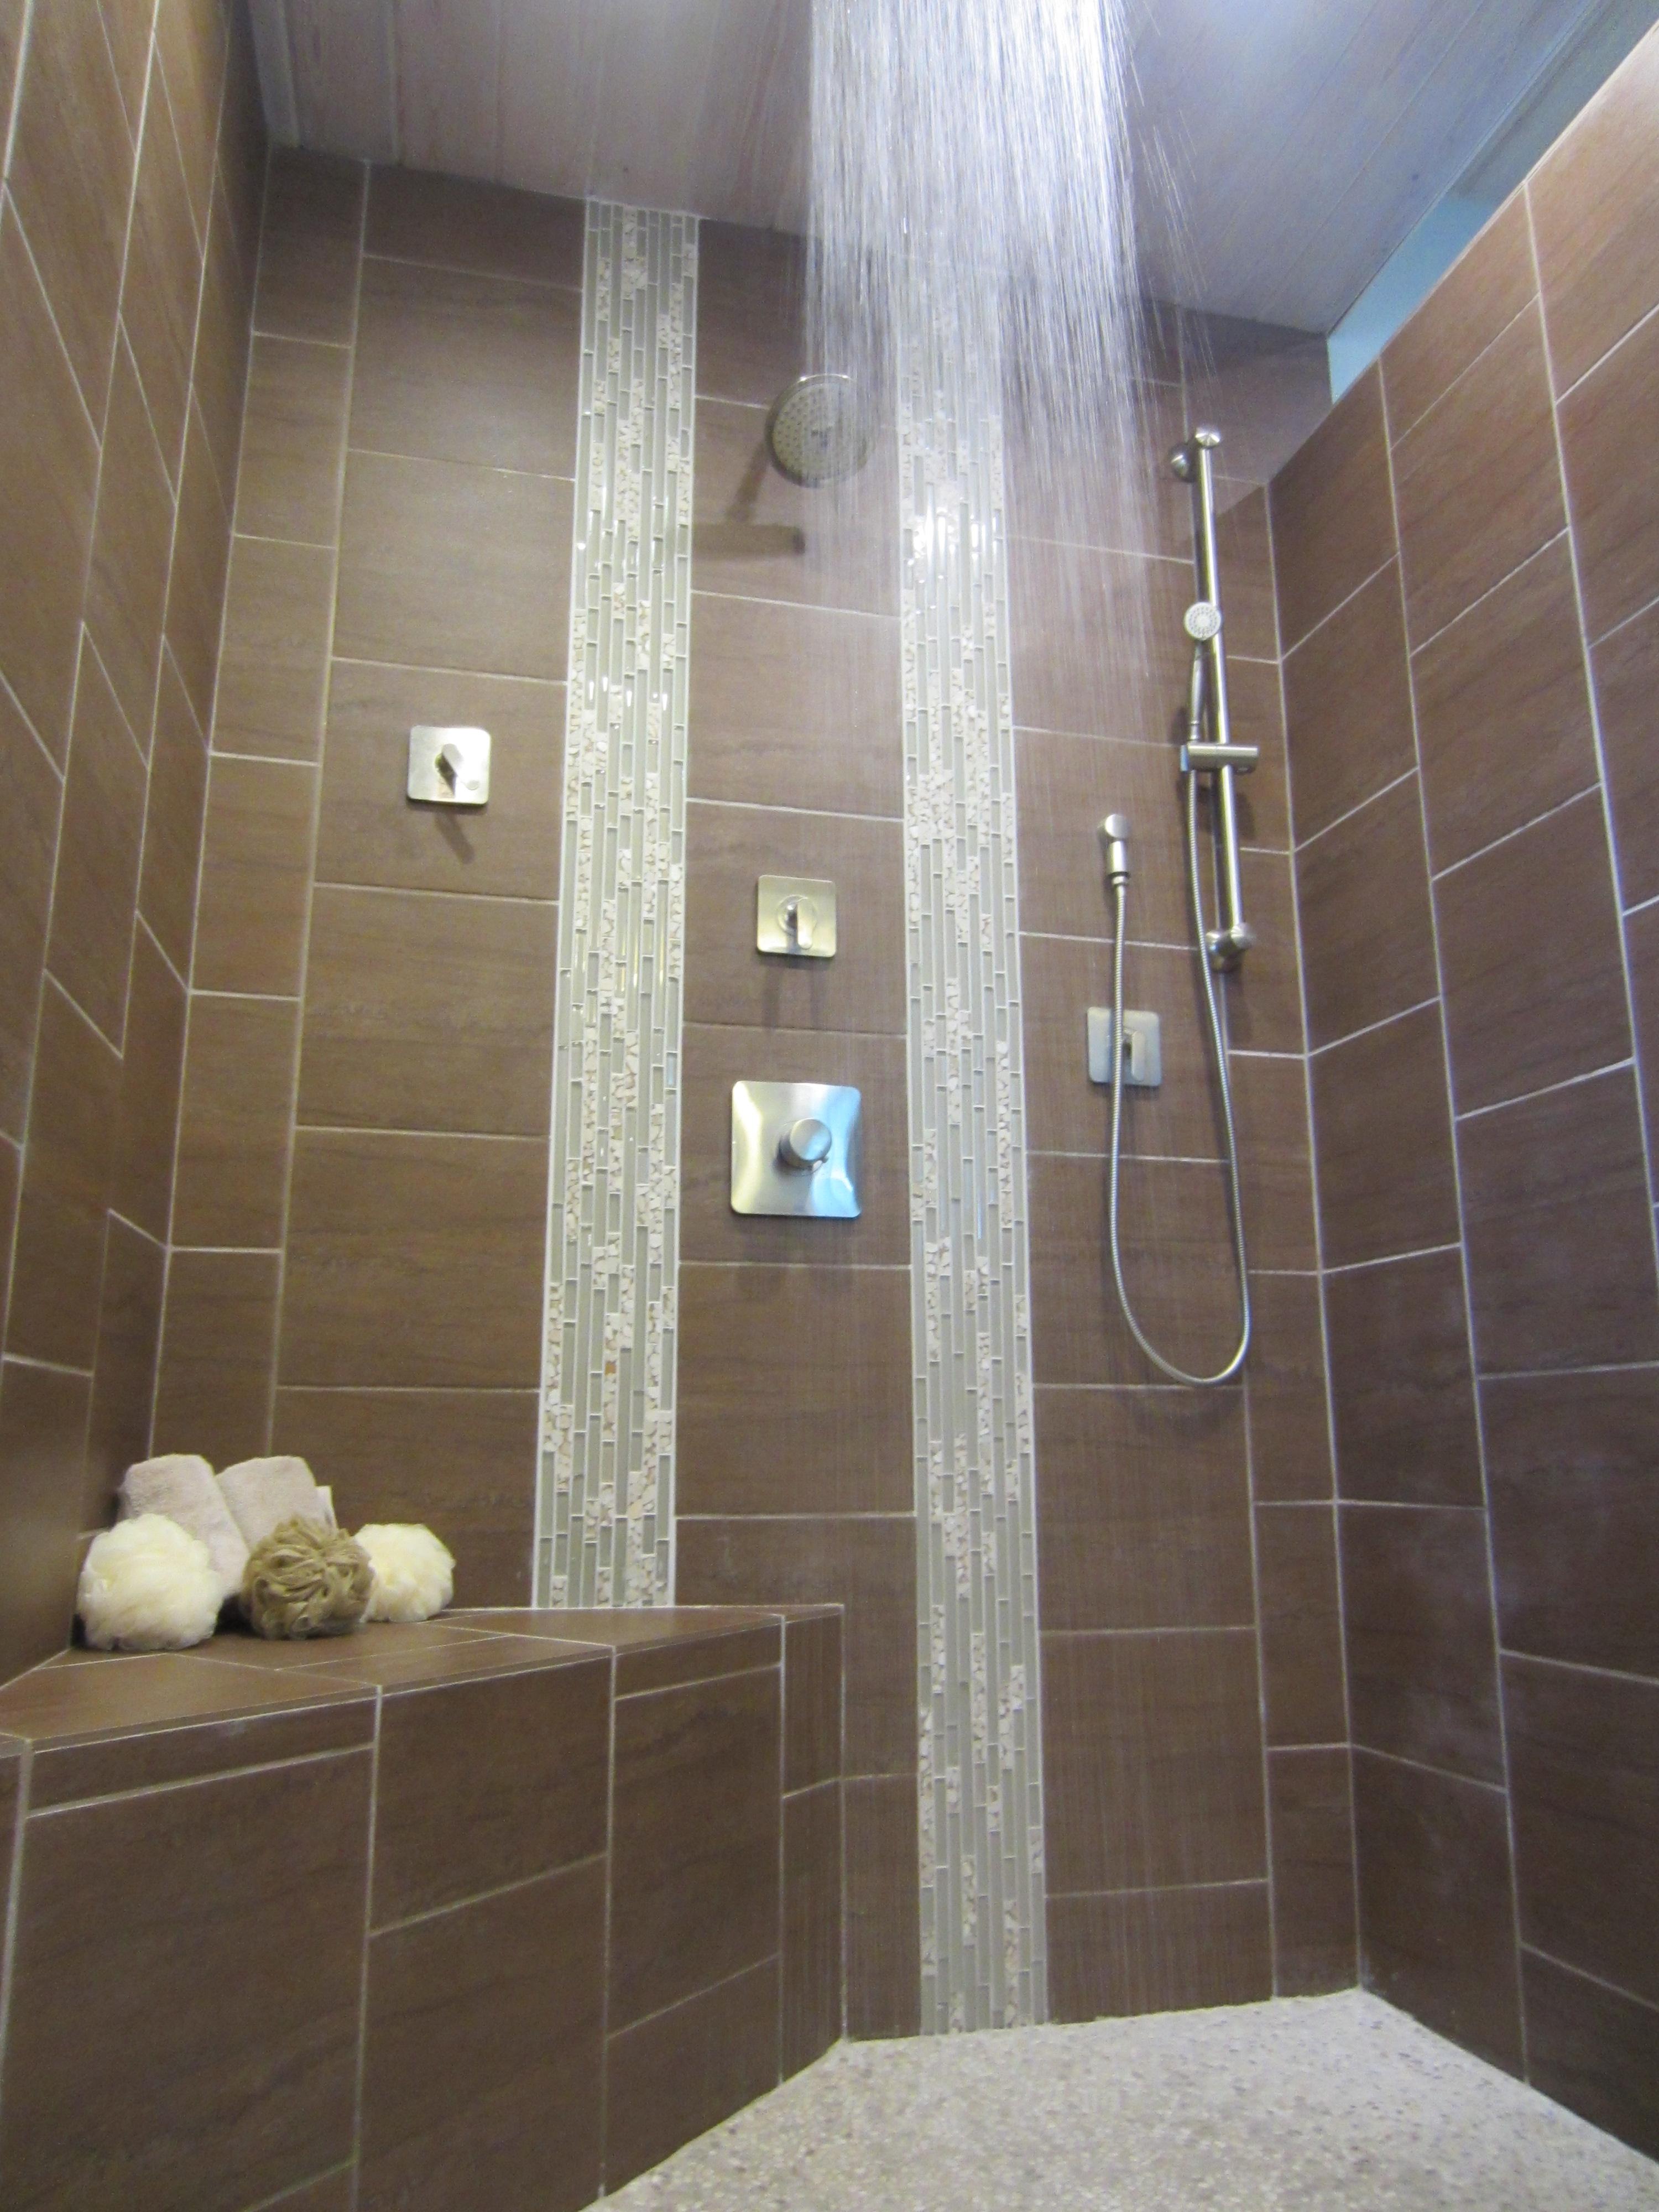 Design Elements Tile Design  Stylish Living with RCI